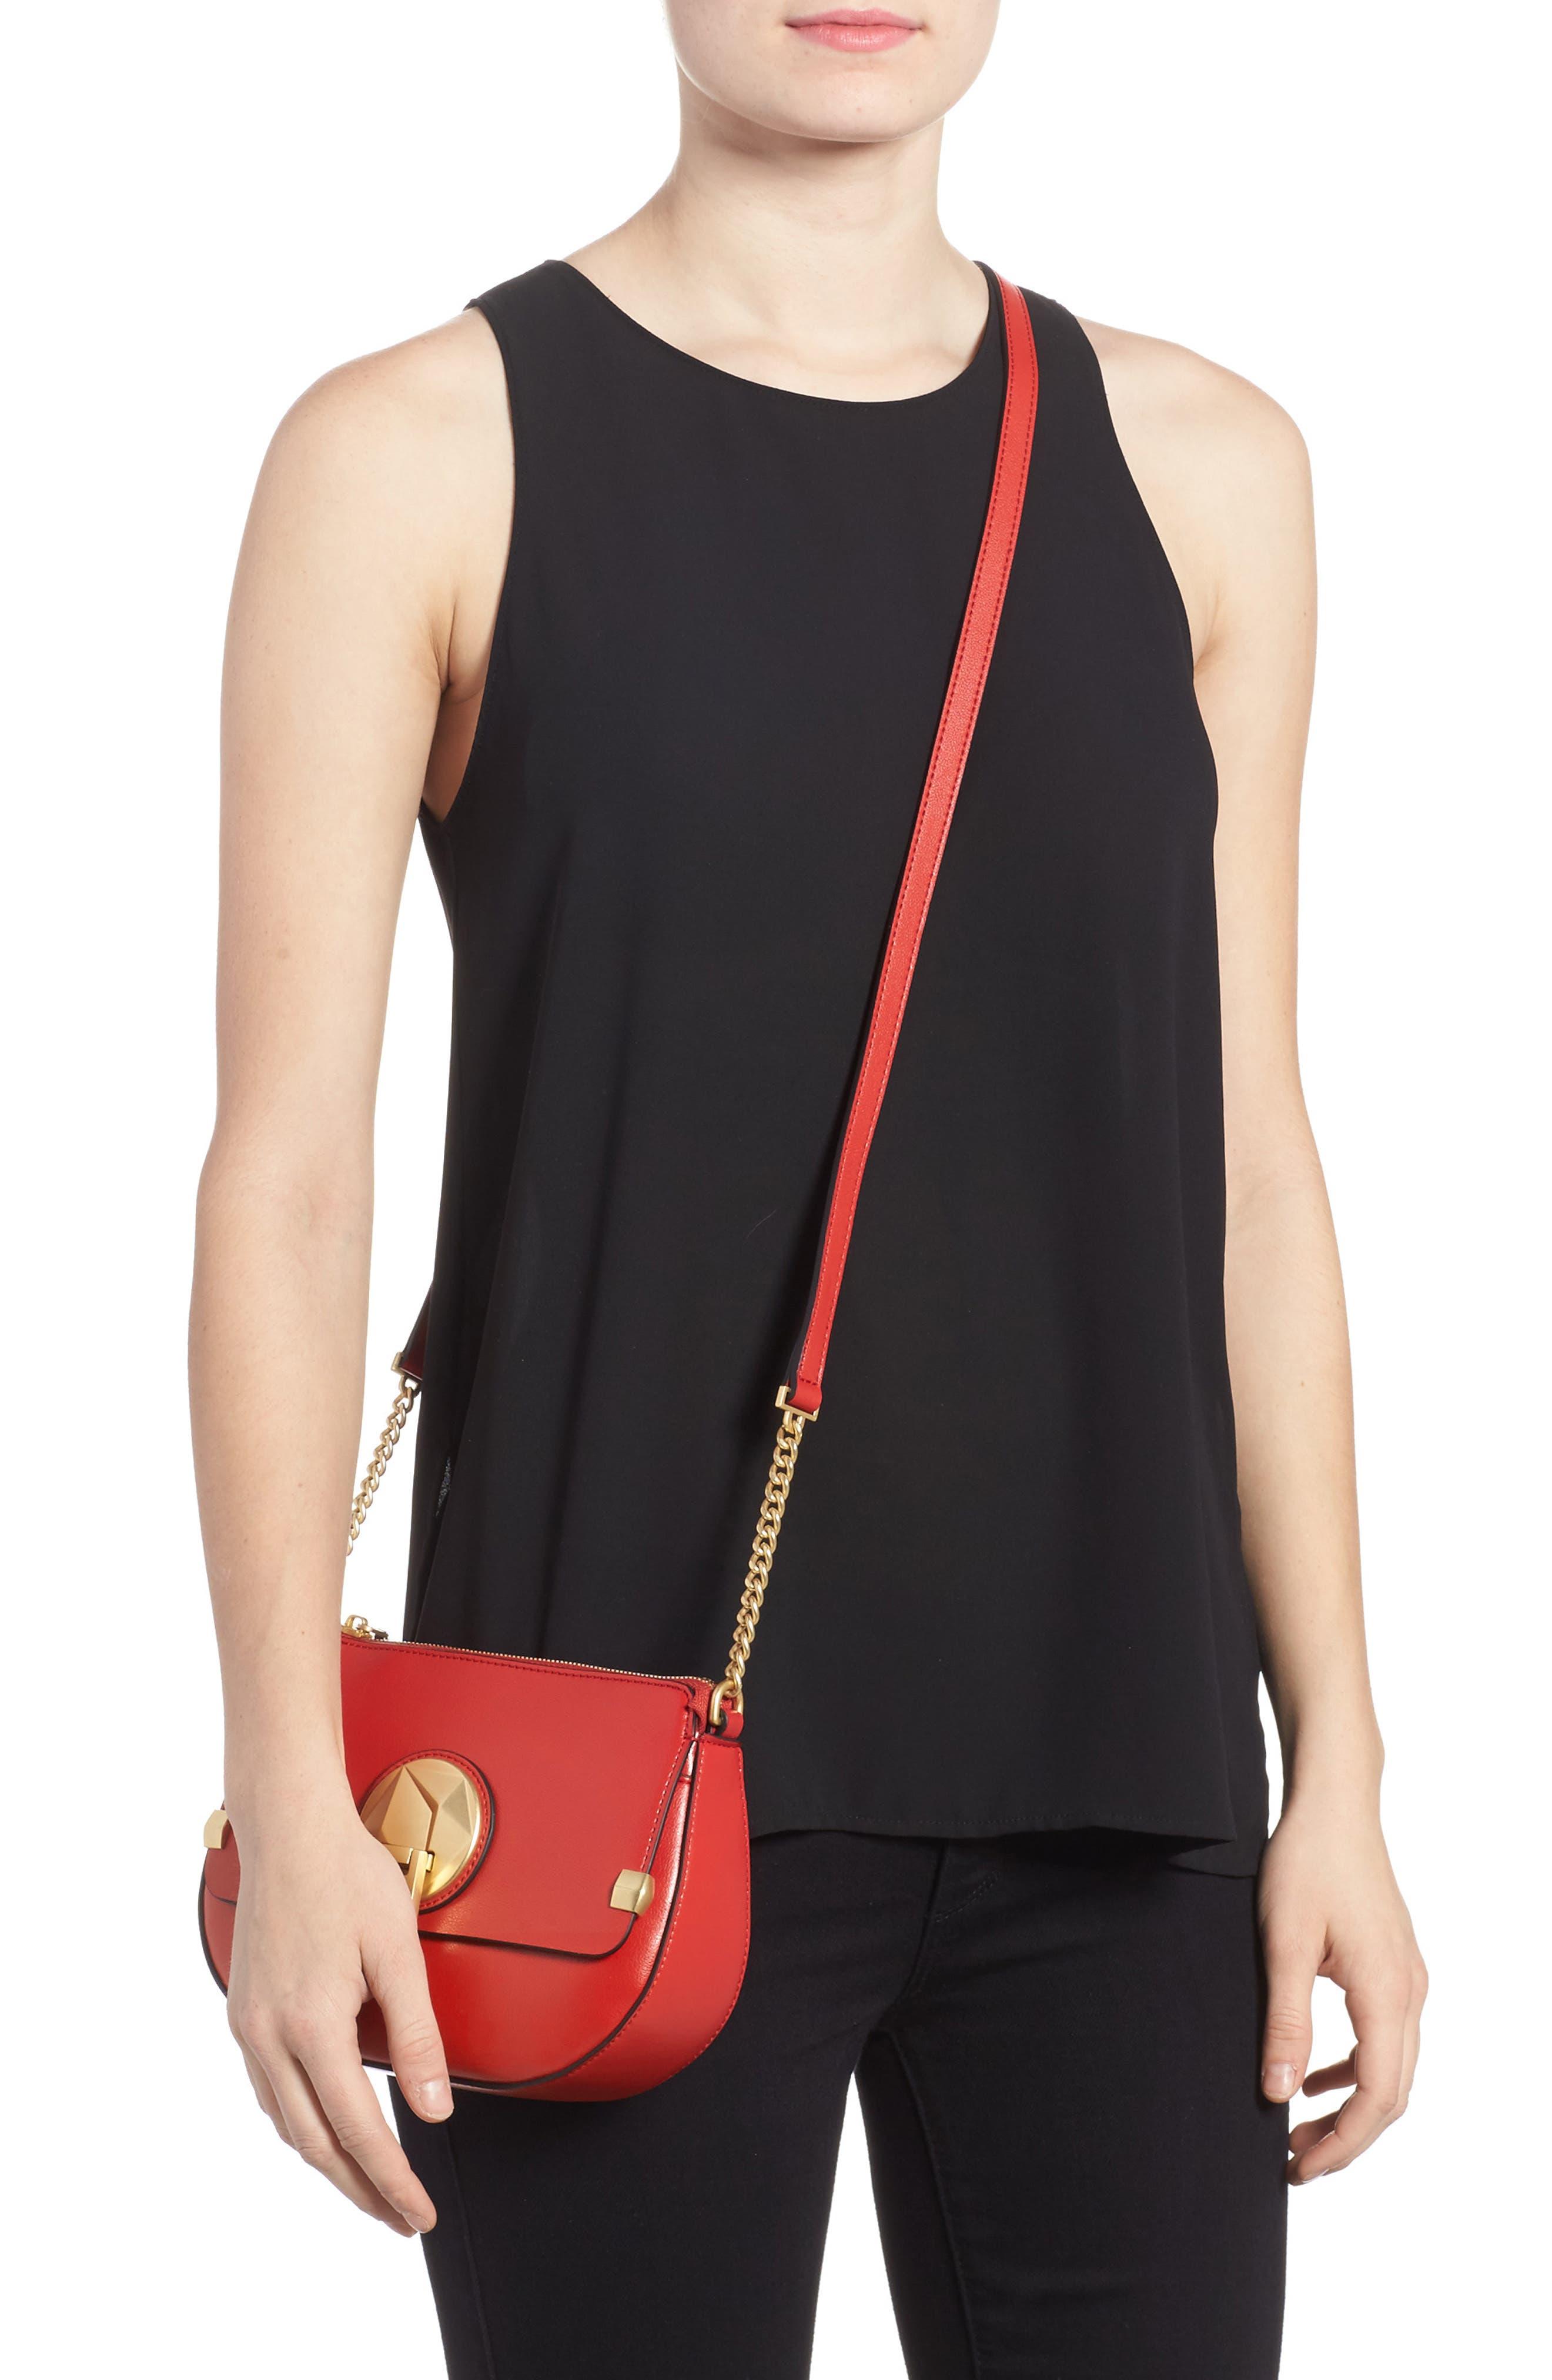 Céline Dion Octave Leather Crossbody Bag,                             Alternate thumbnail 2, color,                             Red